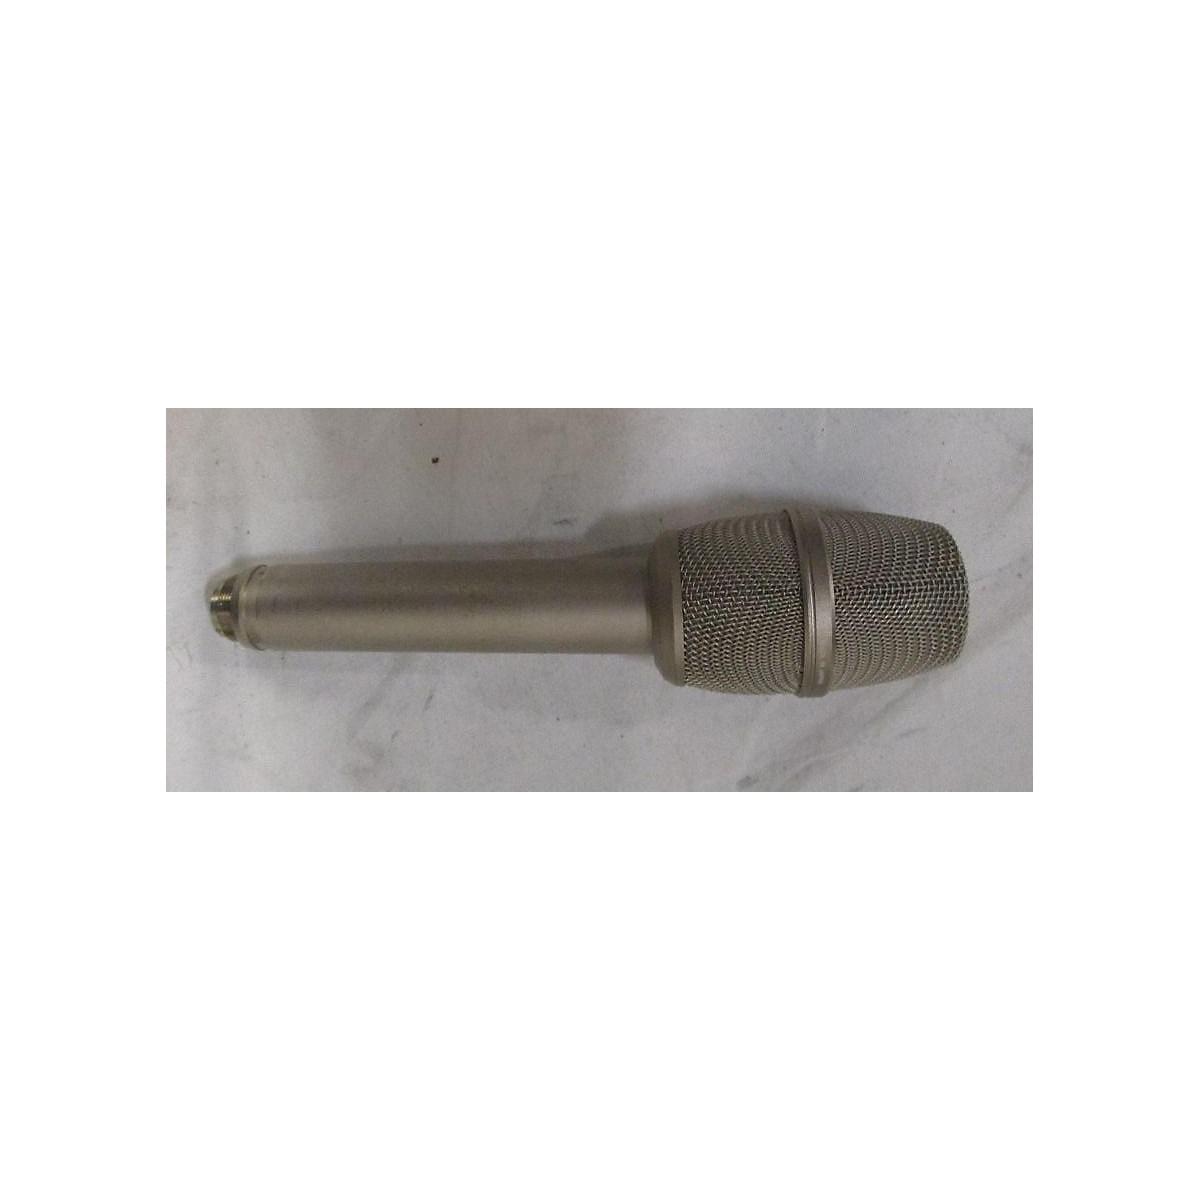 Sony 270 Condenser Microphone